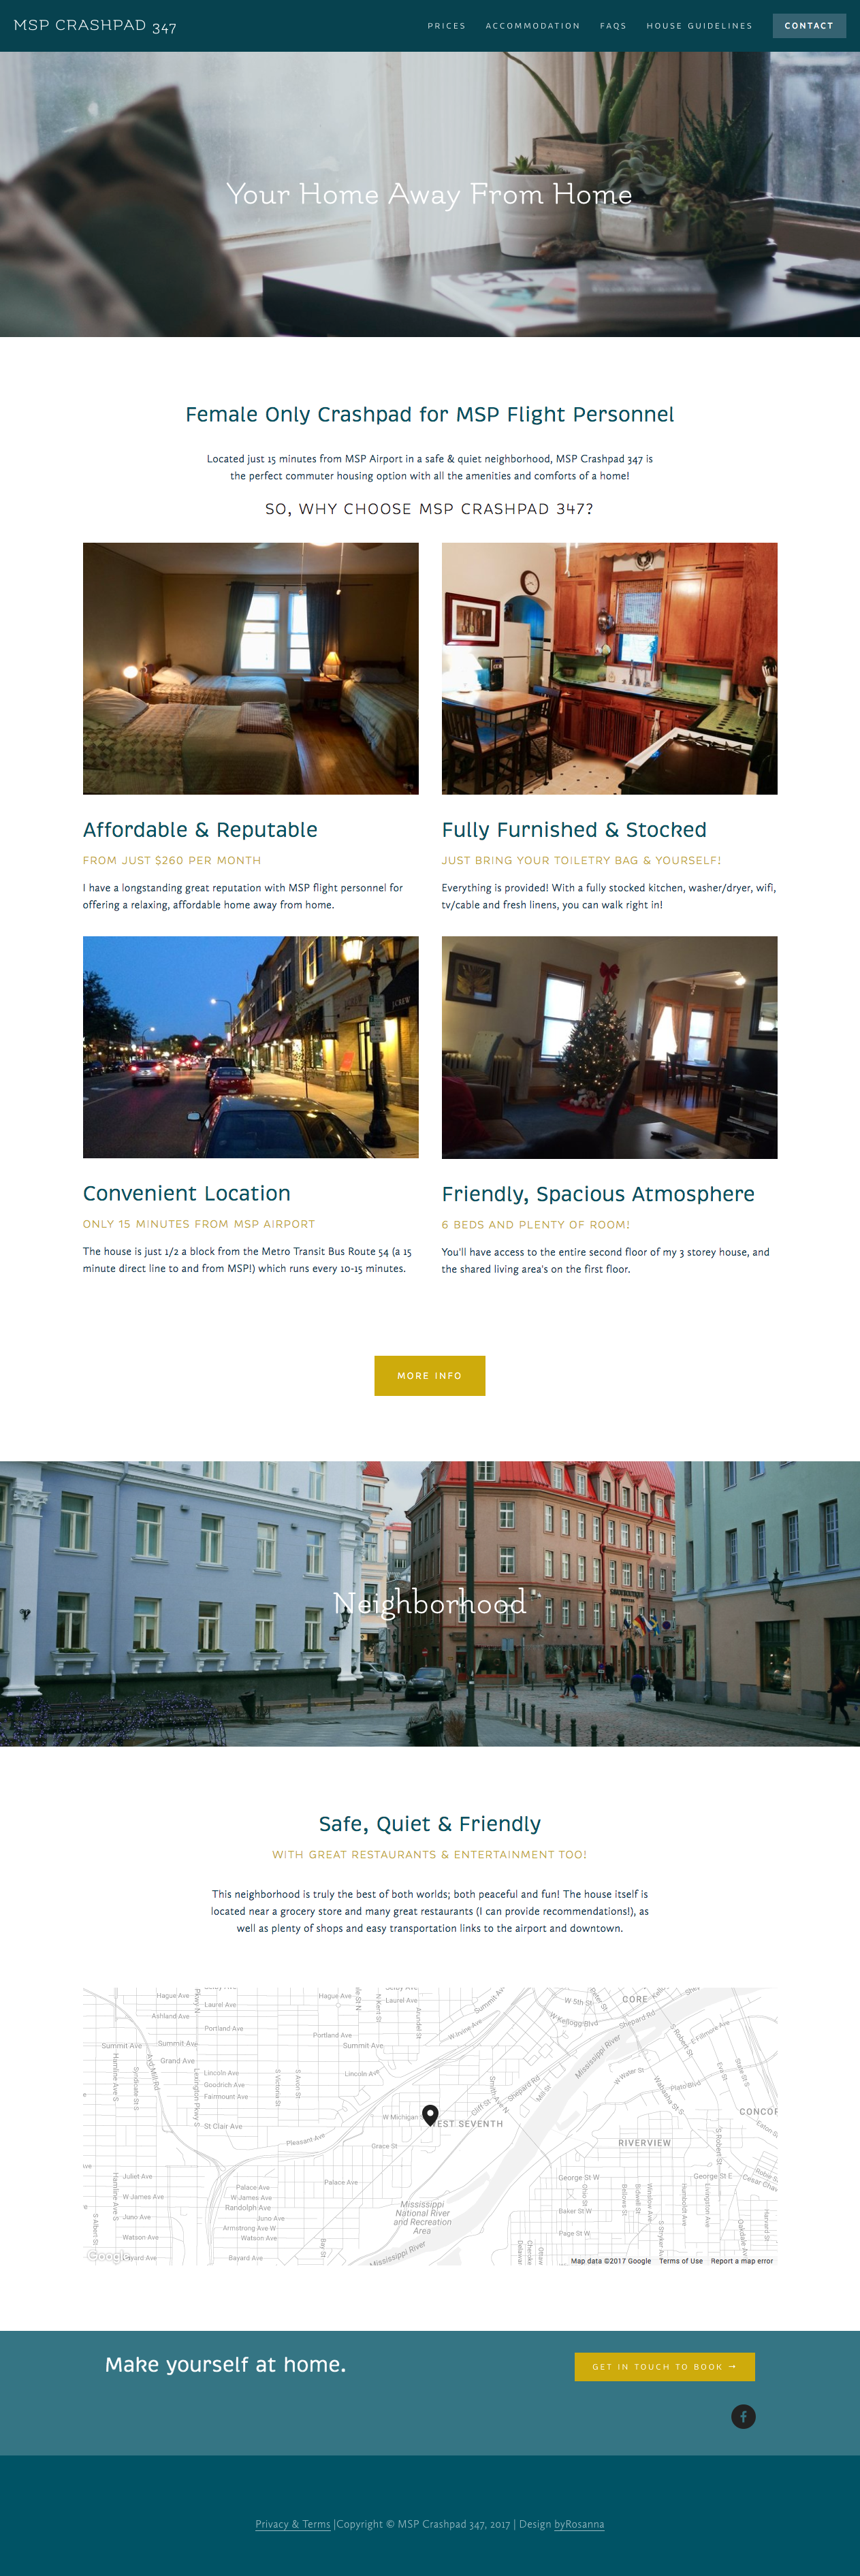 MSP Crashpad 347 Website Design | byRosanna